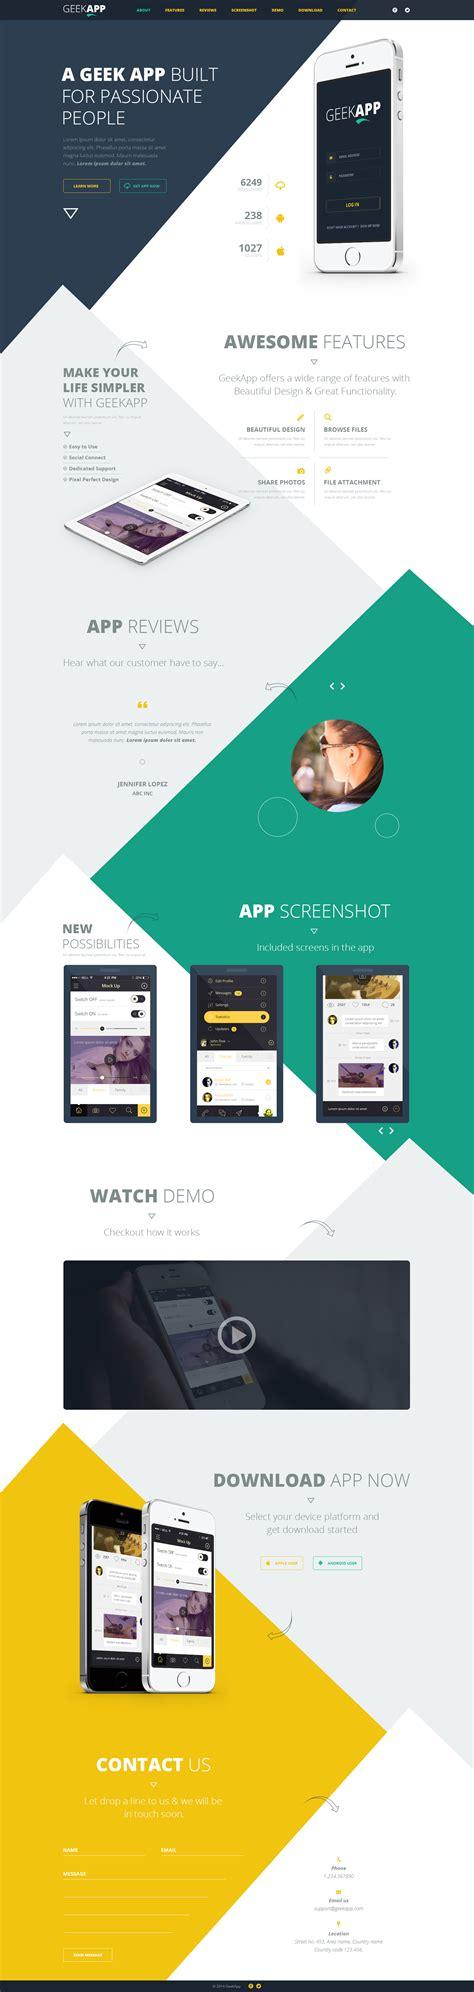 geekapp one page app landing psd template web design free stuff web design inspiration